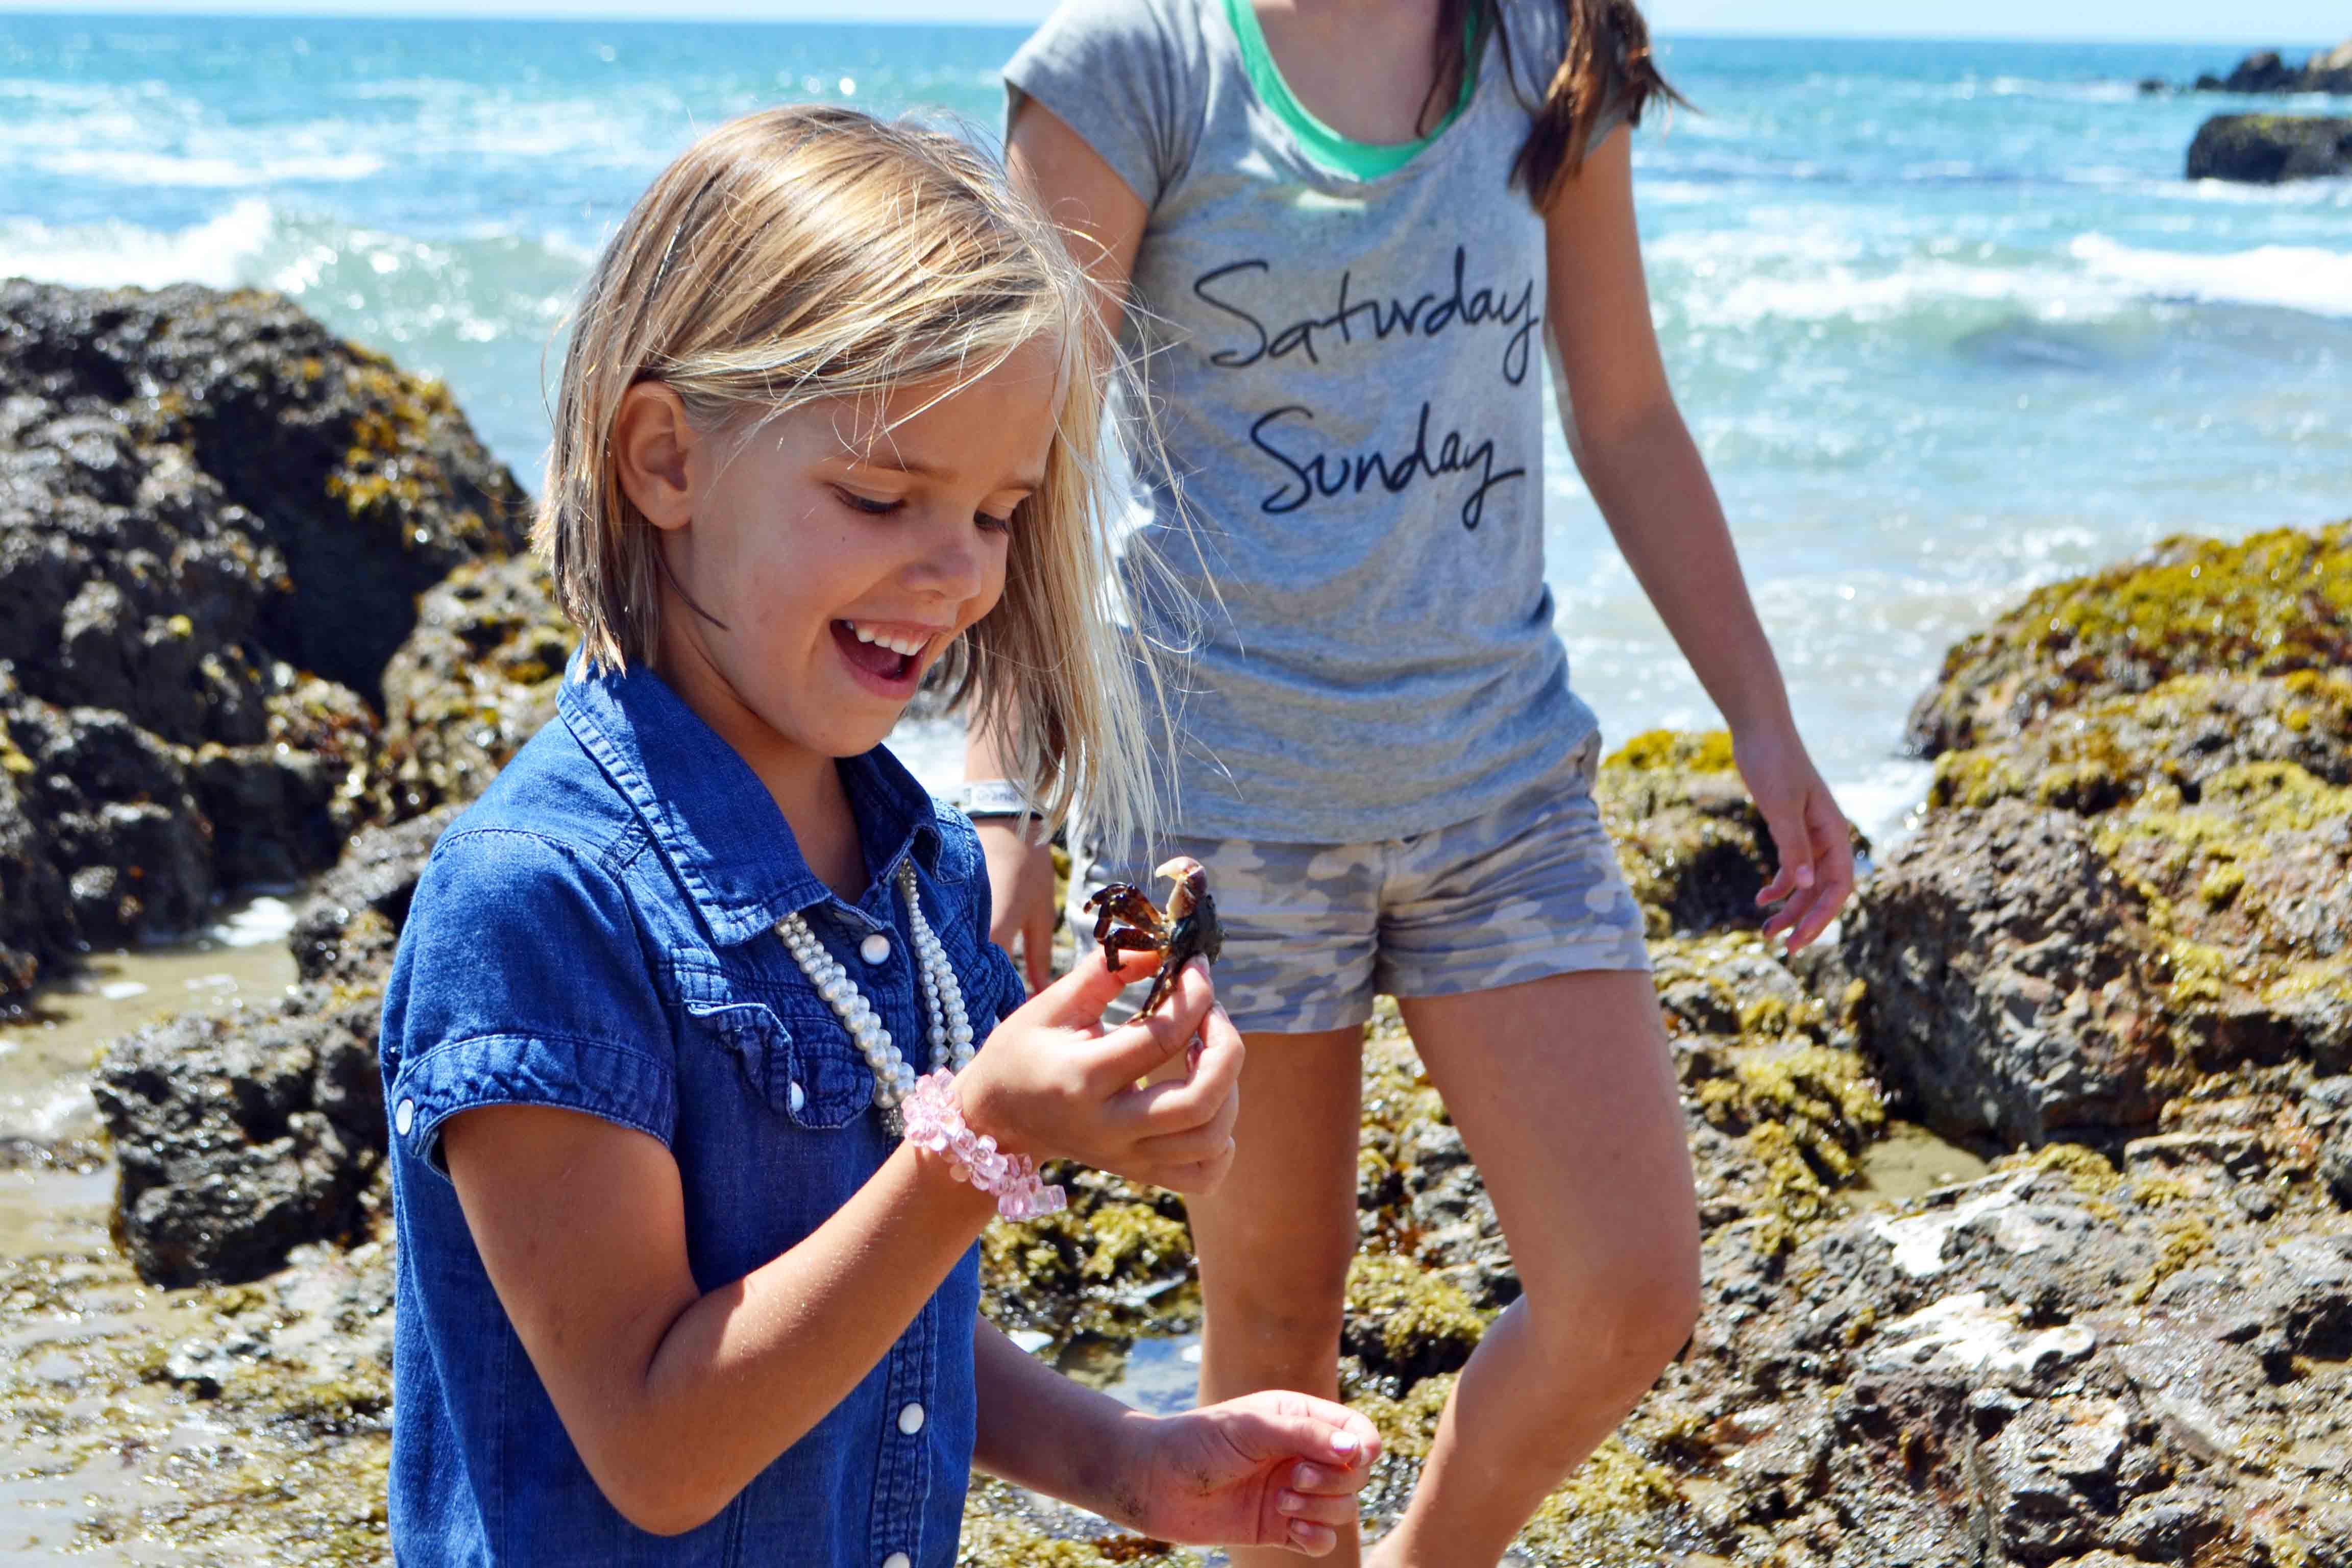 Tide Pools California Pacific Coast Highway 1 Road Trip Guide by Modern Honey. www.modernhoney.com